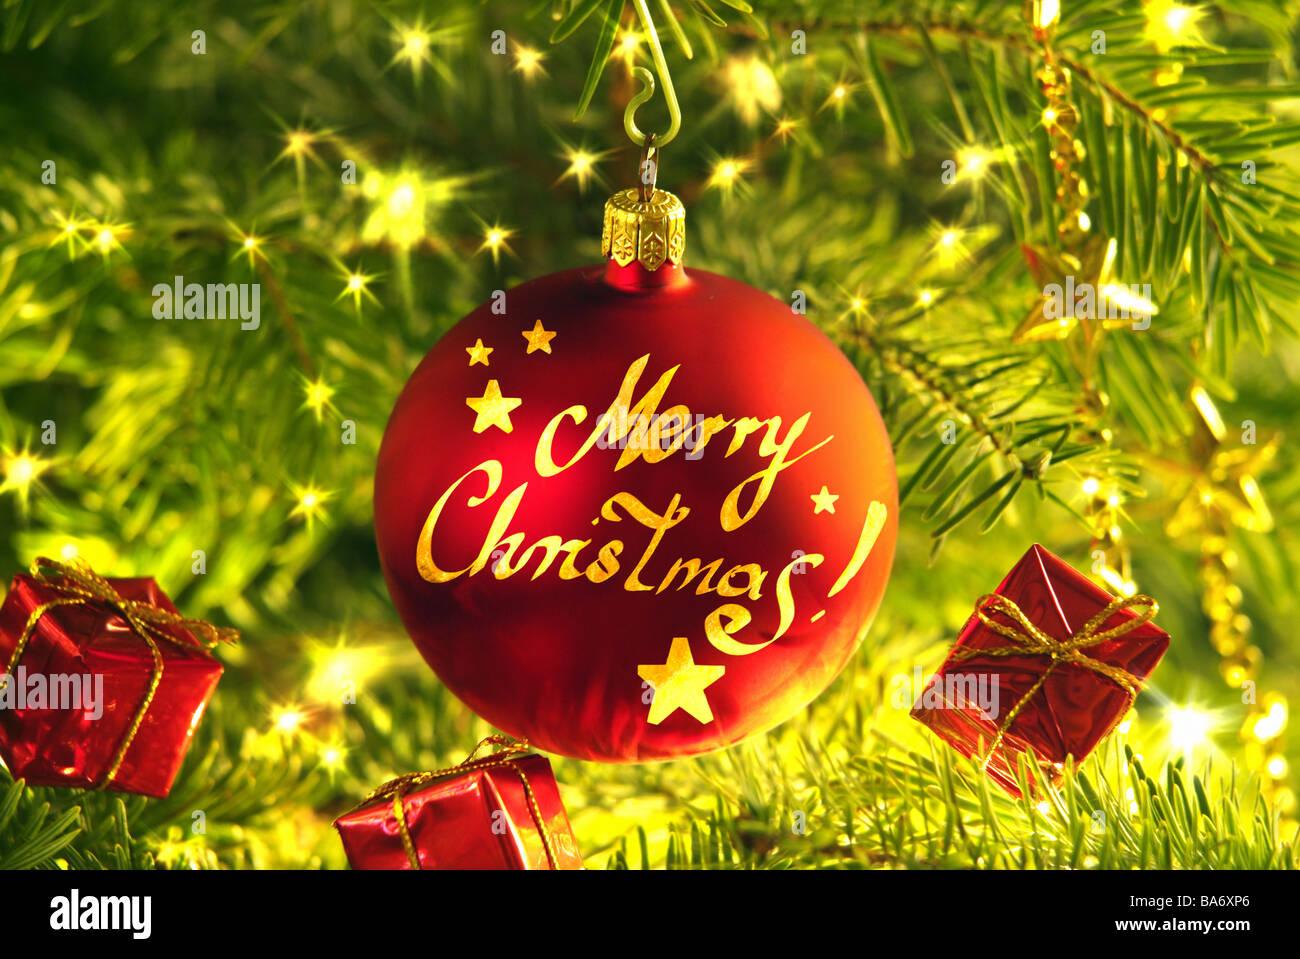 Christmas Christian Tree Close Up Fir Branches Christian Tree Ball